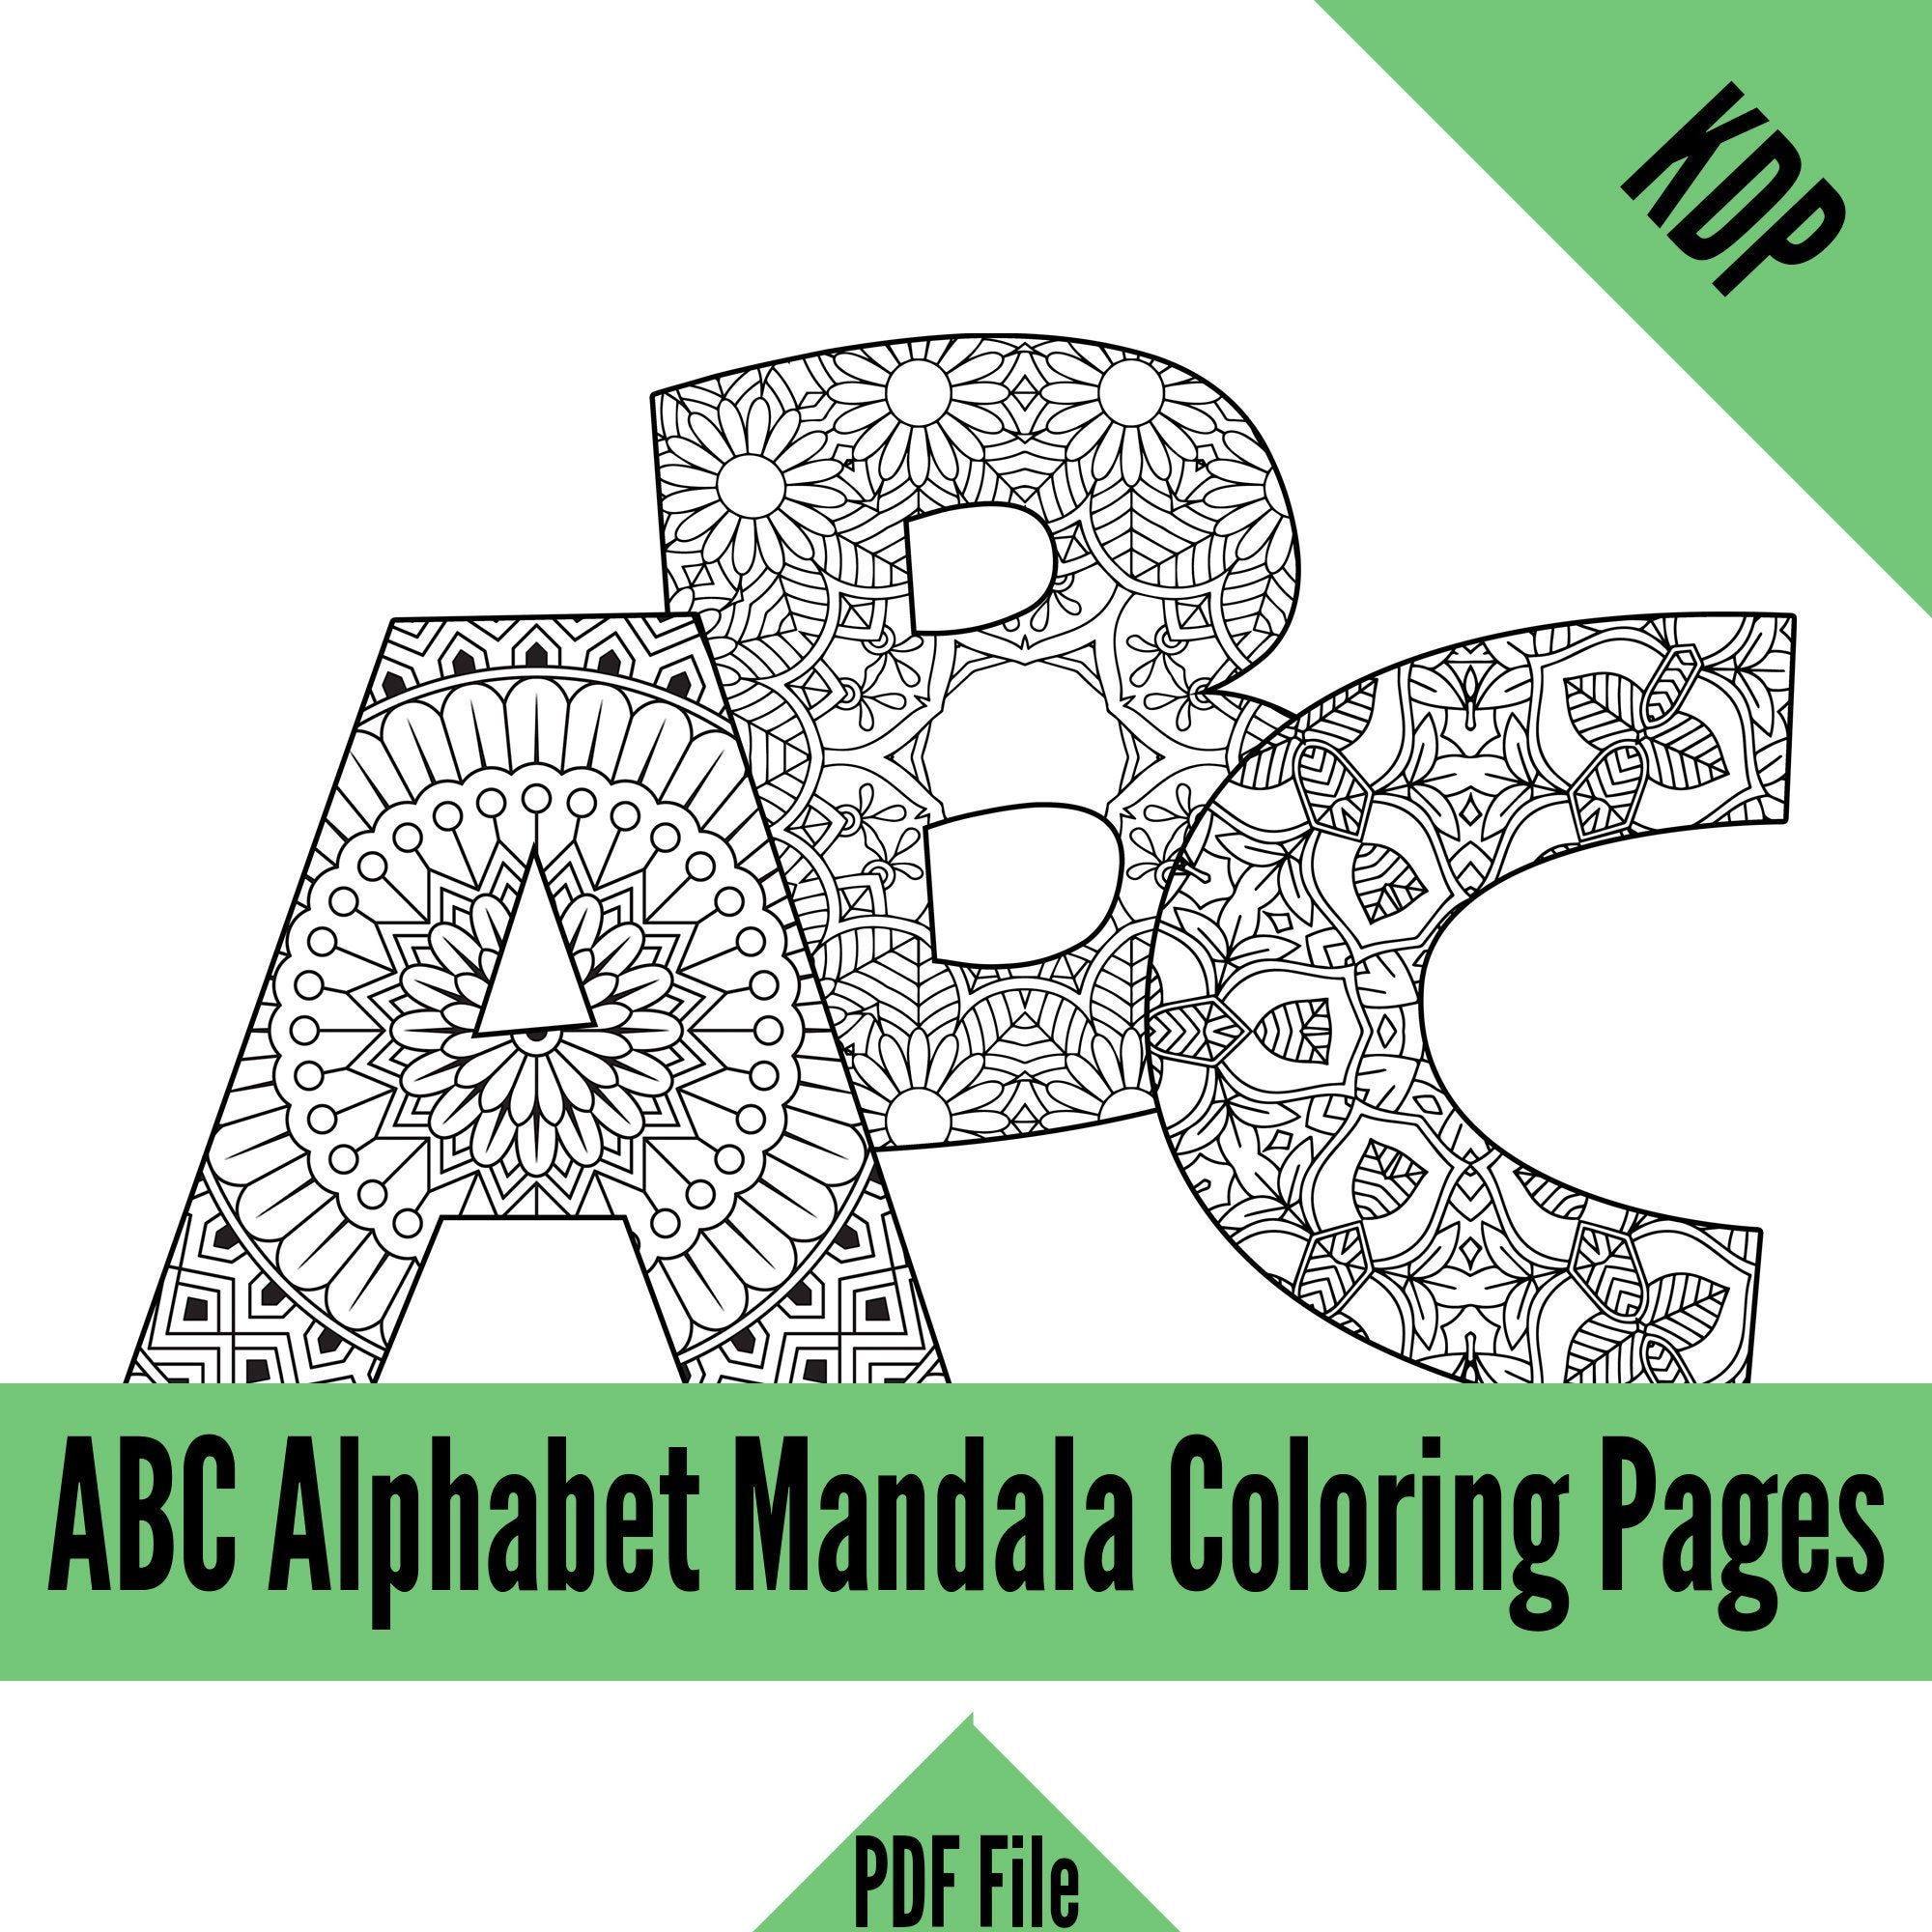 Kdp Alphabet Mandalas Coloring Pages Sheets Pdf Abc Letters Etsy Coloring Pages Letter A Coloring Pages Coloring Books